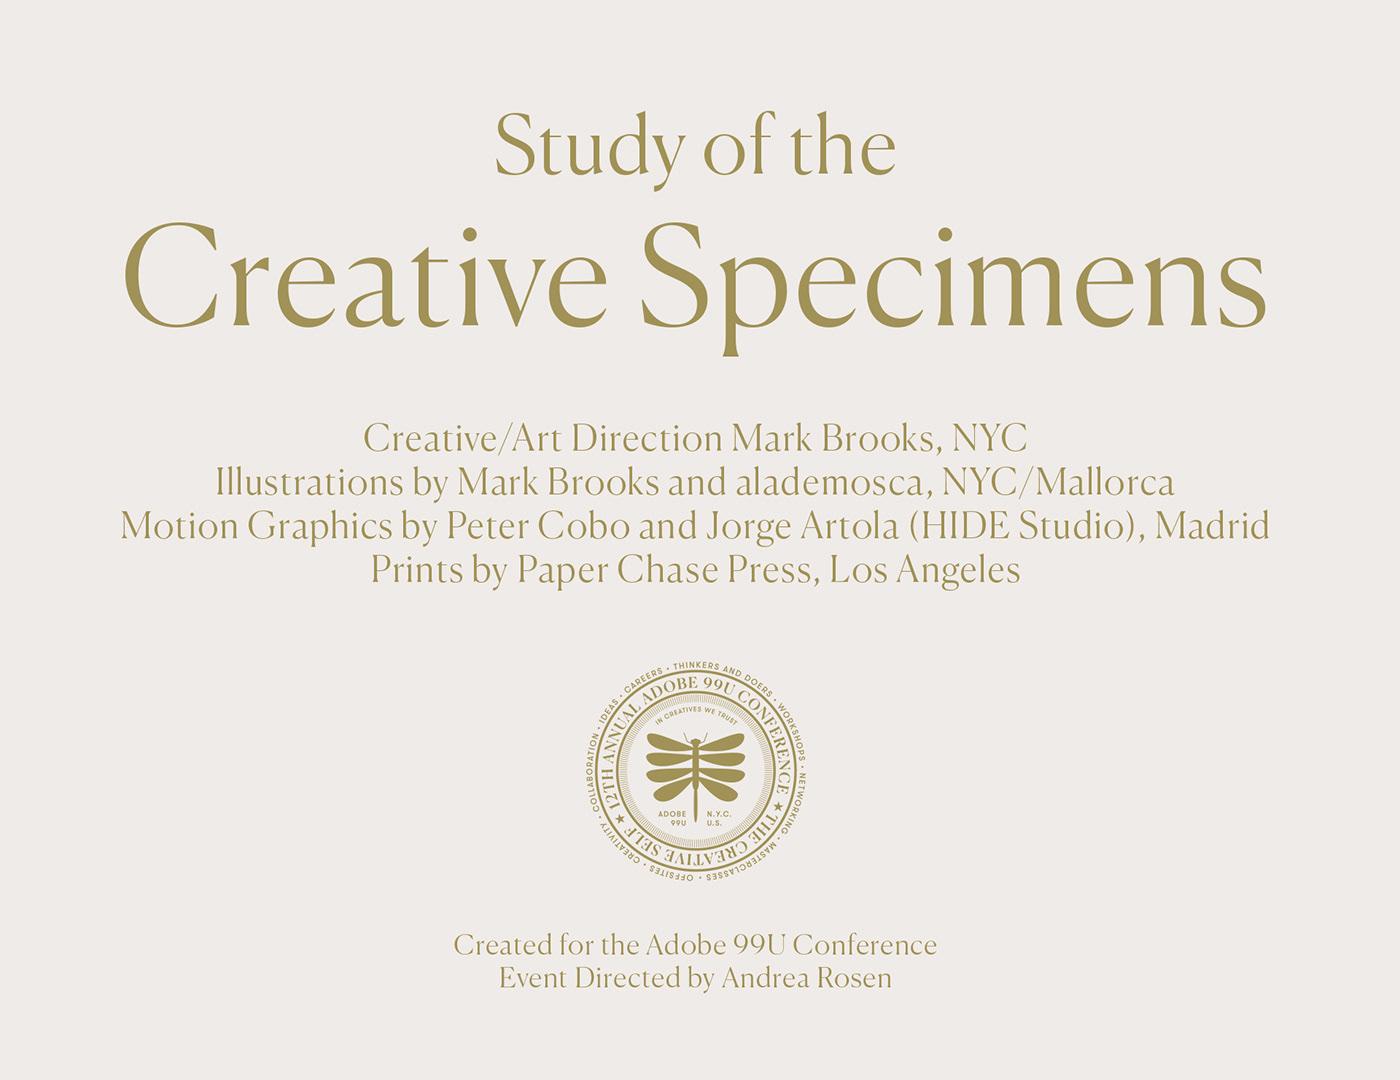 art direction  brand identity branding  Event Design graphic design  ILLUSTRATION  motion graphics  Poster Design print